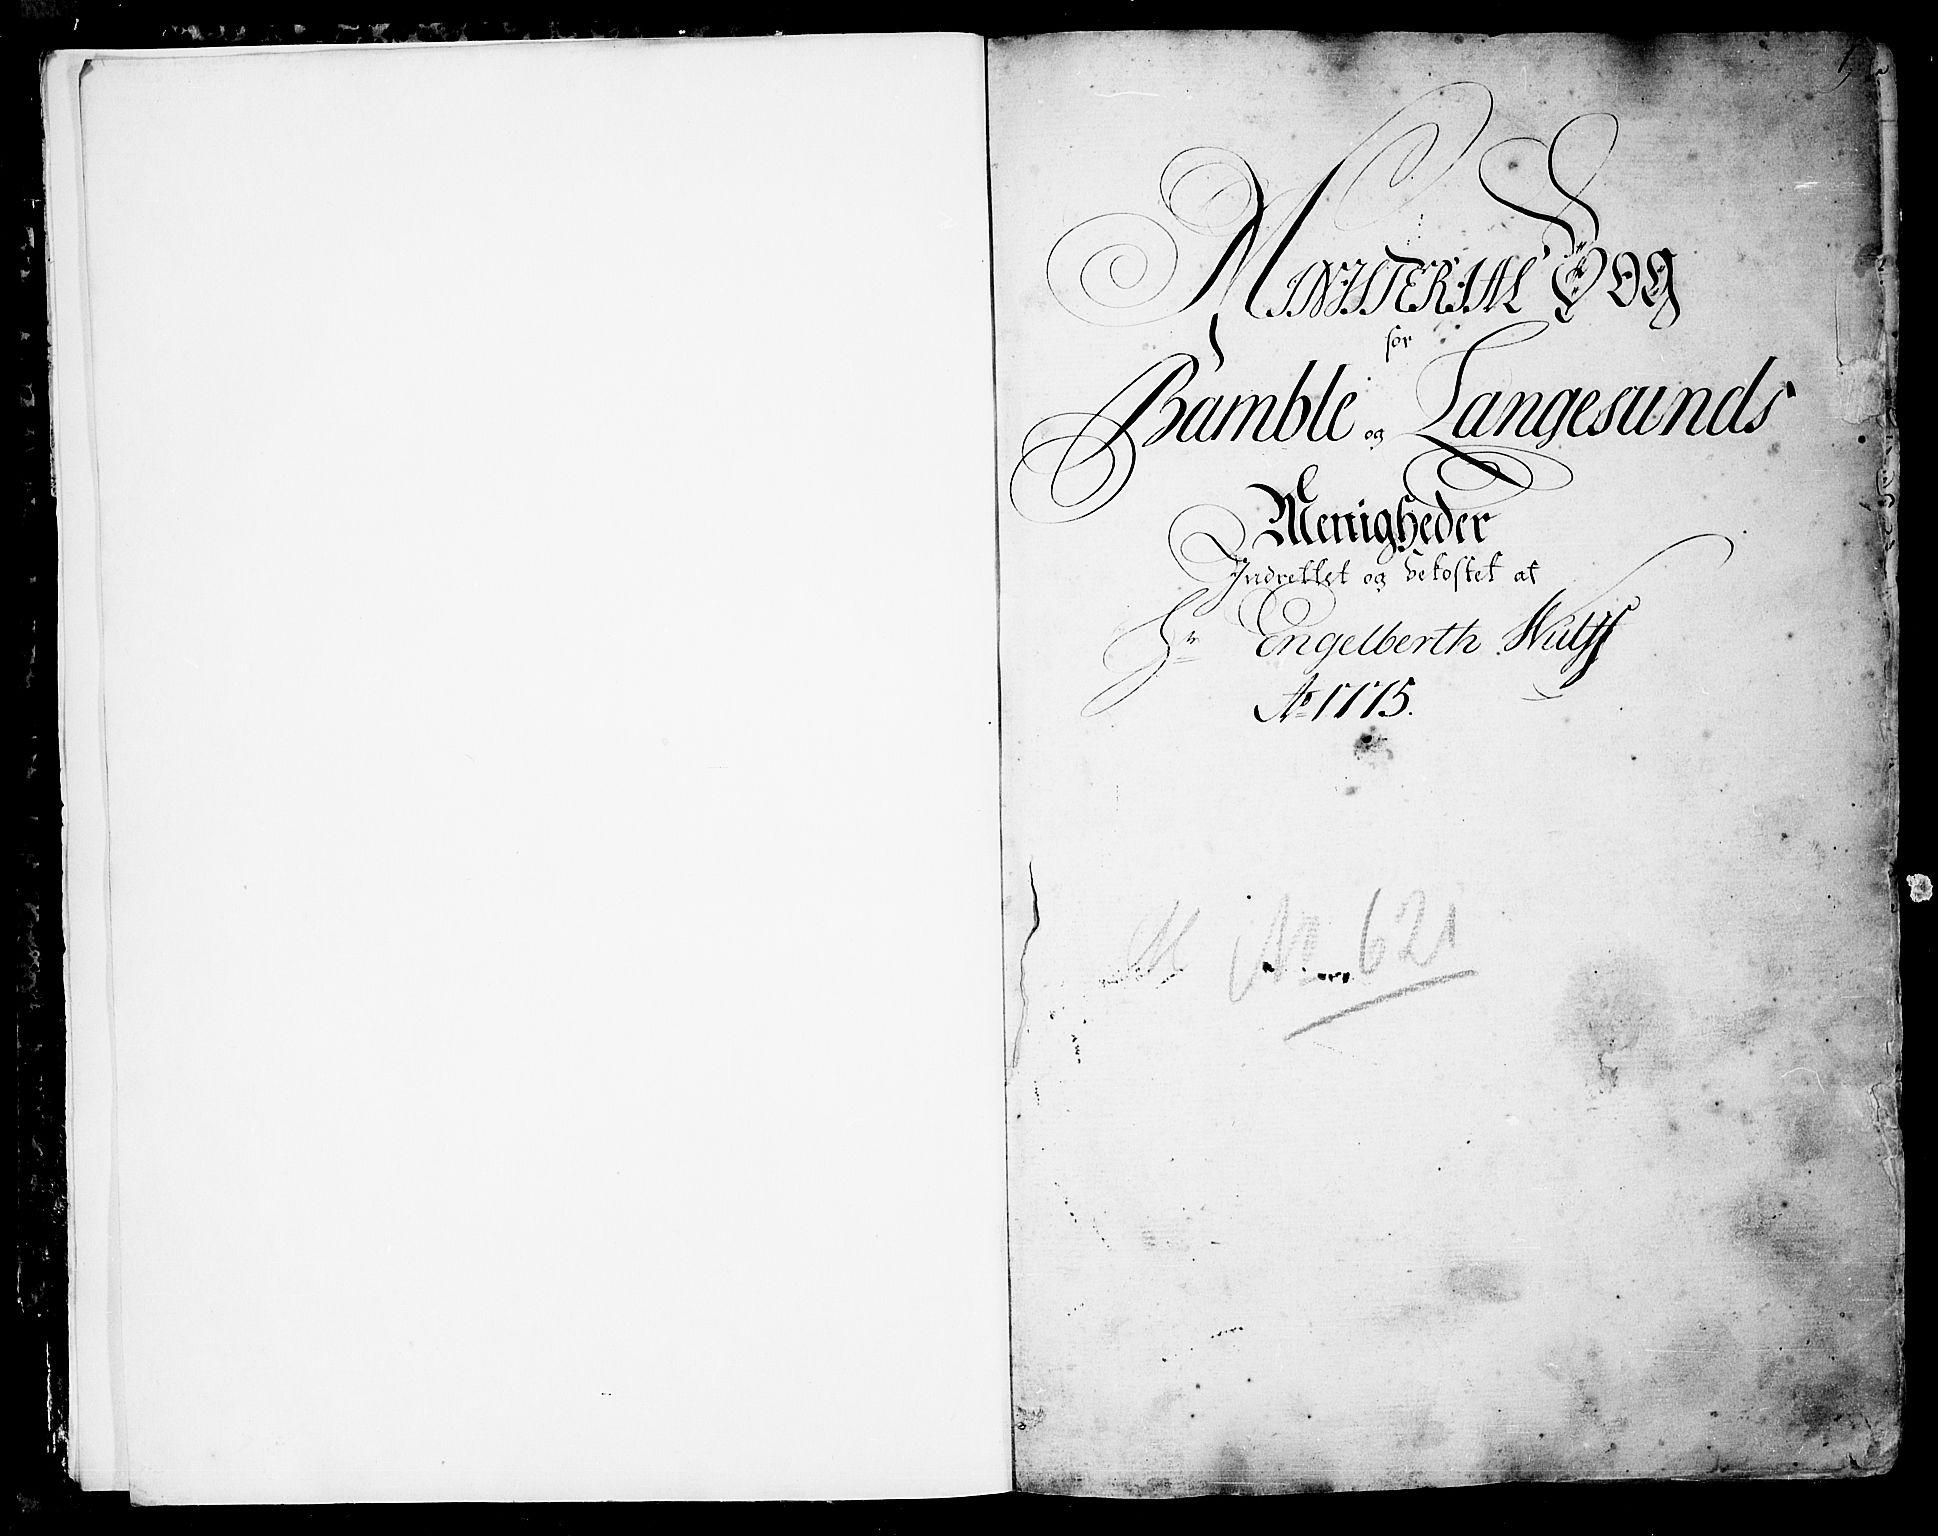 SAKO, Bamble kirkebøker, F/Fa/L0002: Ministerialbok nr. I 2, 1775-1814, s. 0-1